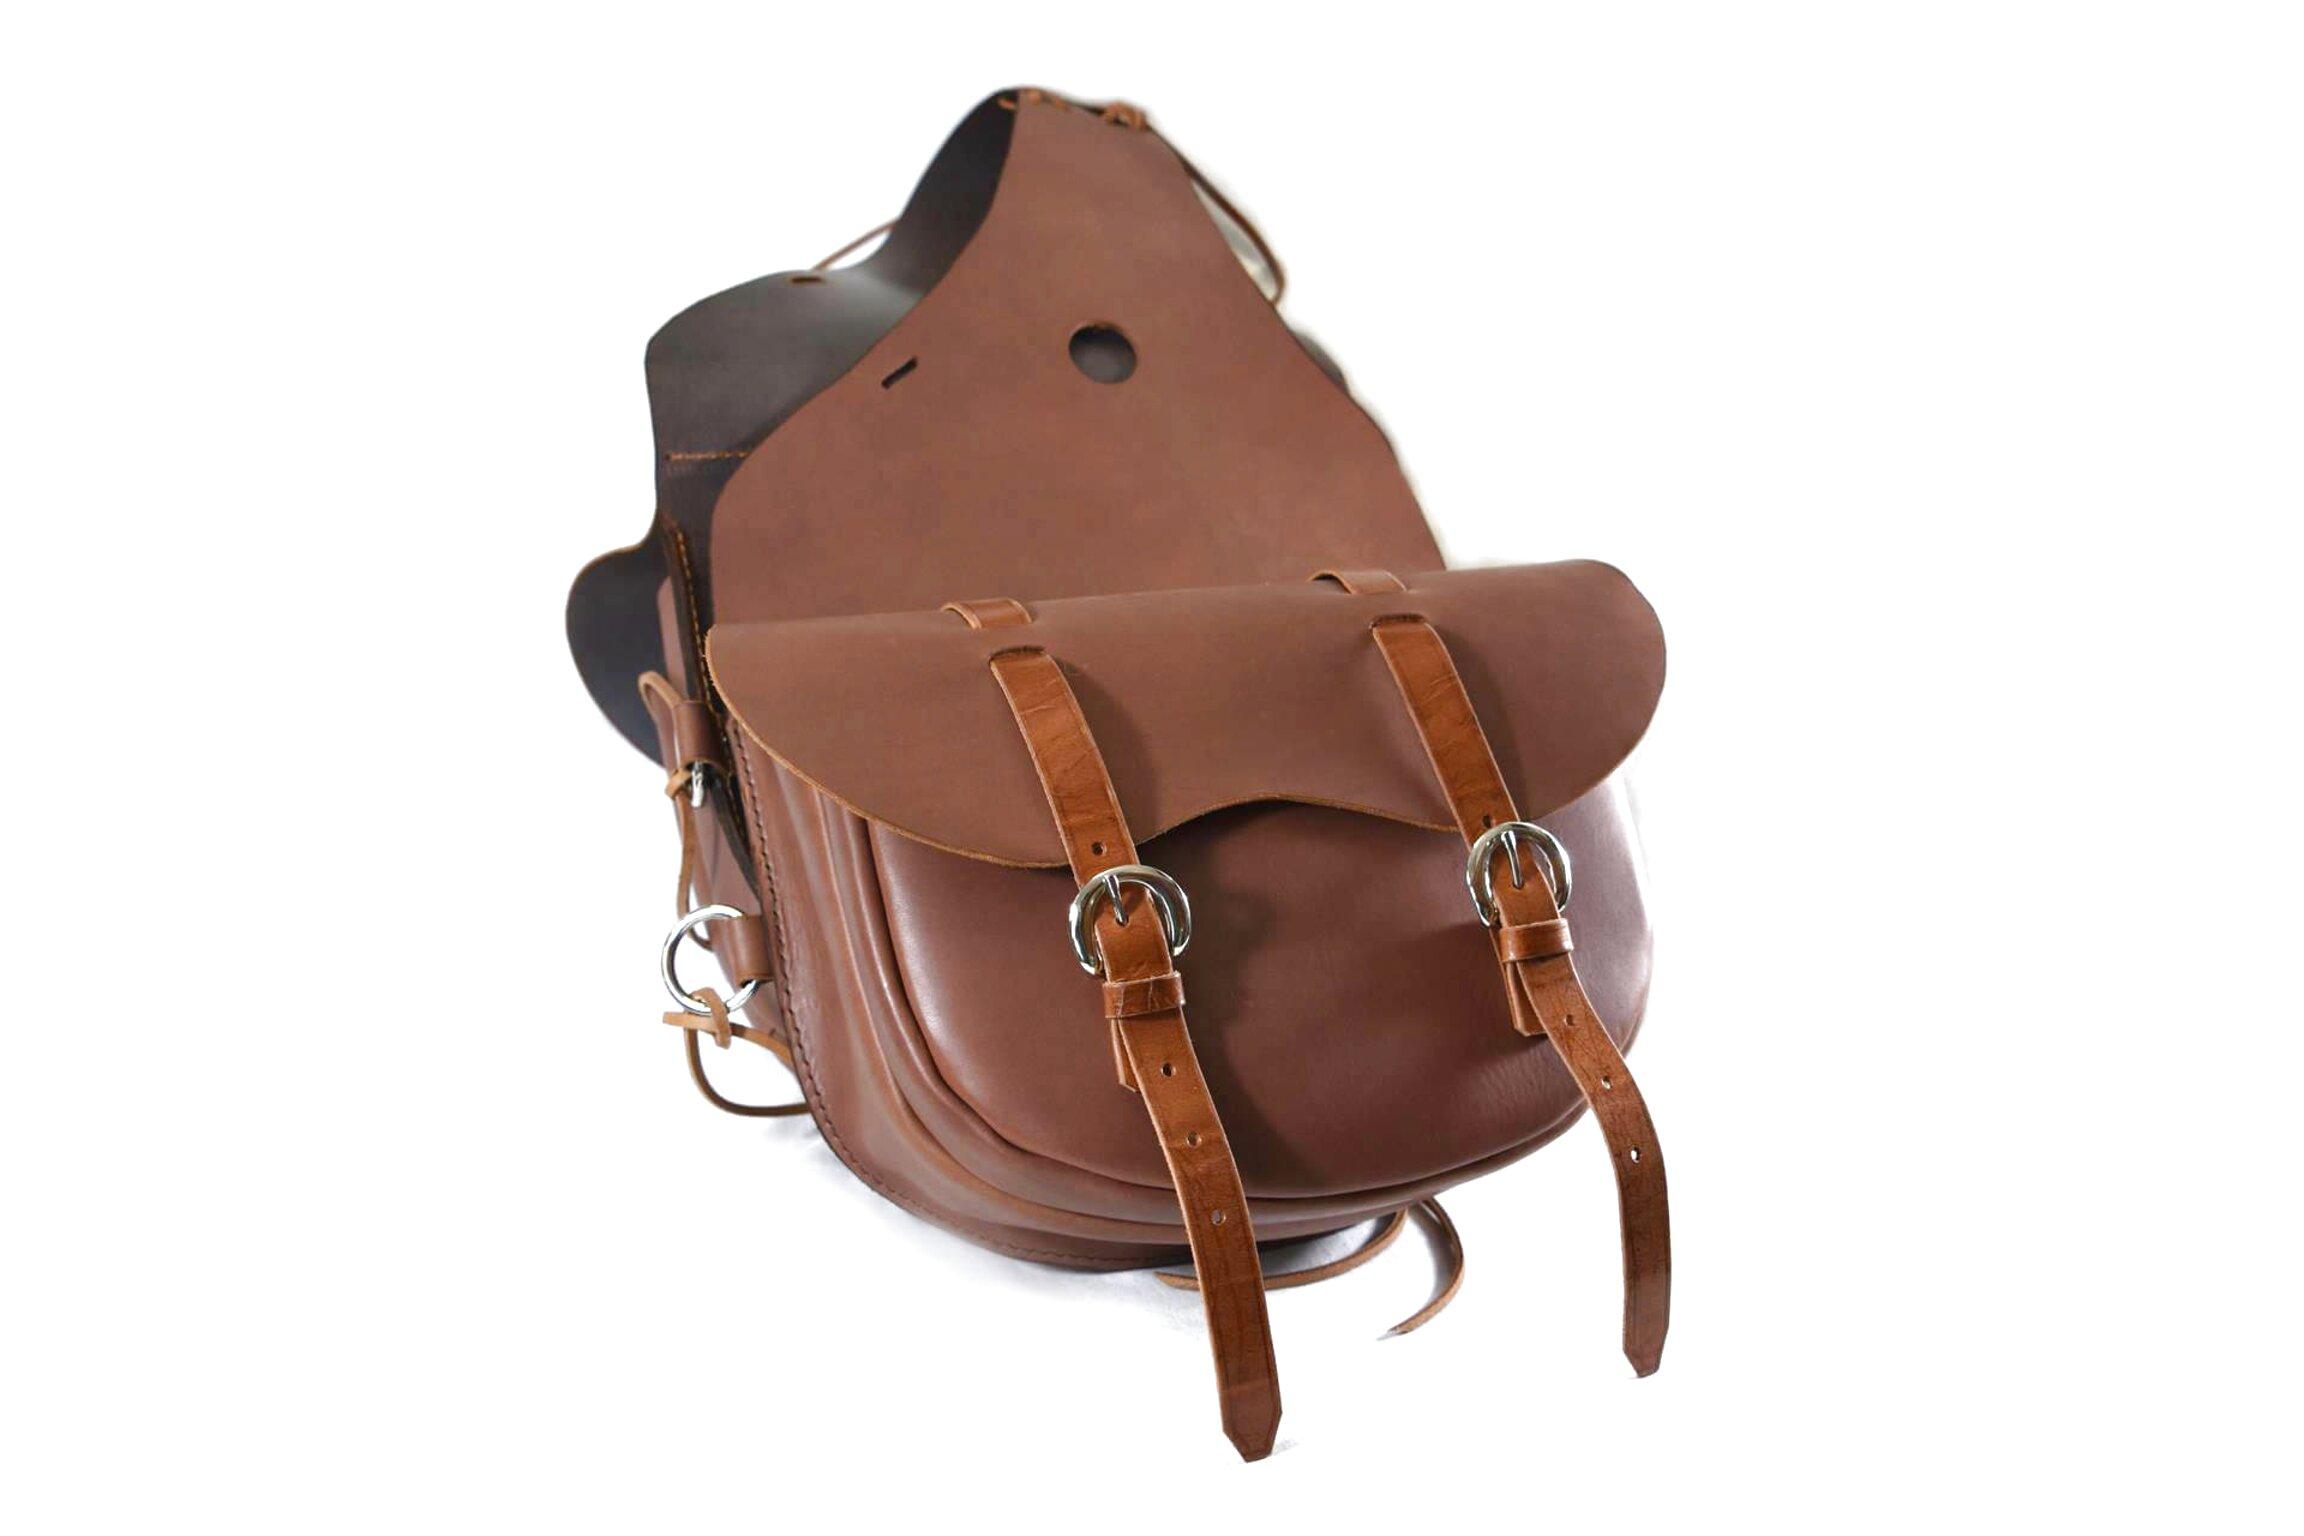 Bisaccia western pomo sella americana borsa saddlebag